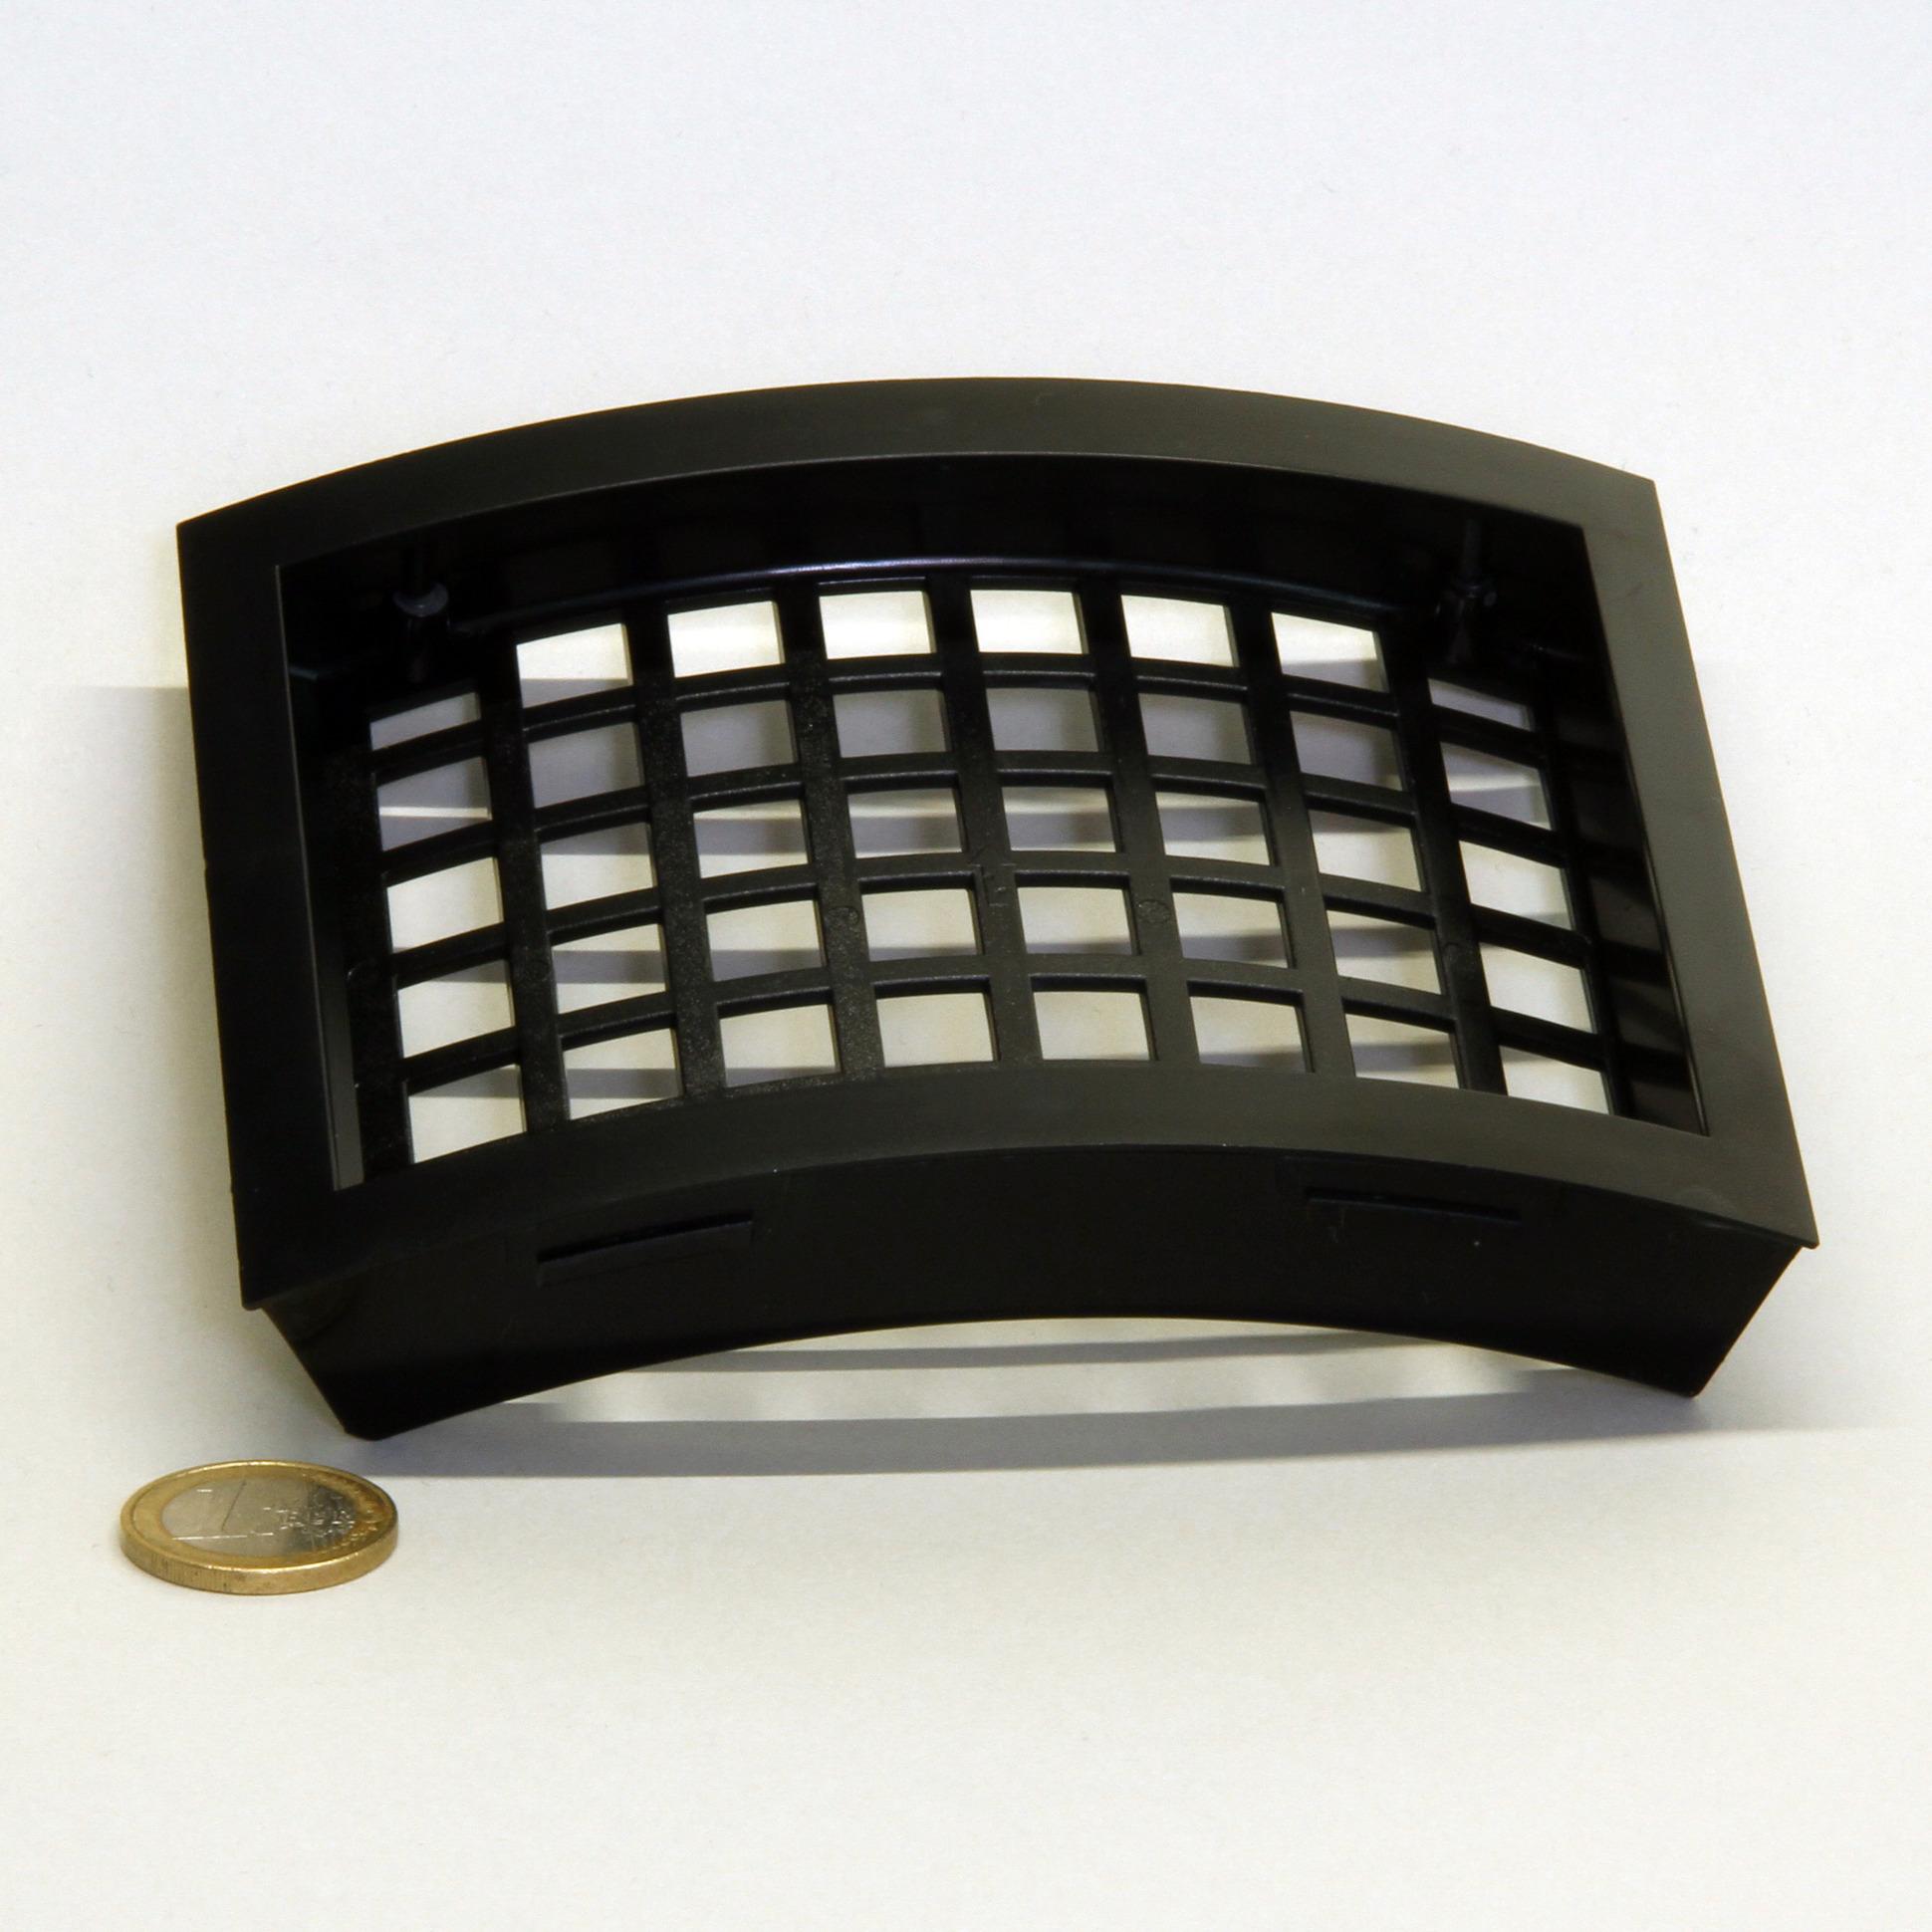 jbl cristalprofi m greenline fixation modul filterpad. Black Bedroom Furniture Sets. Home Design Ideas